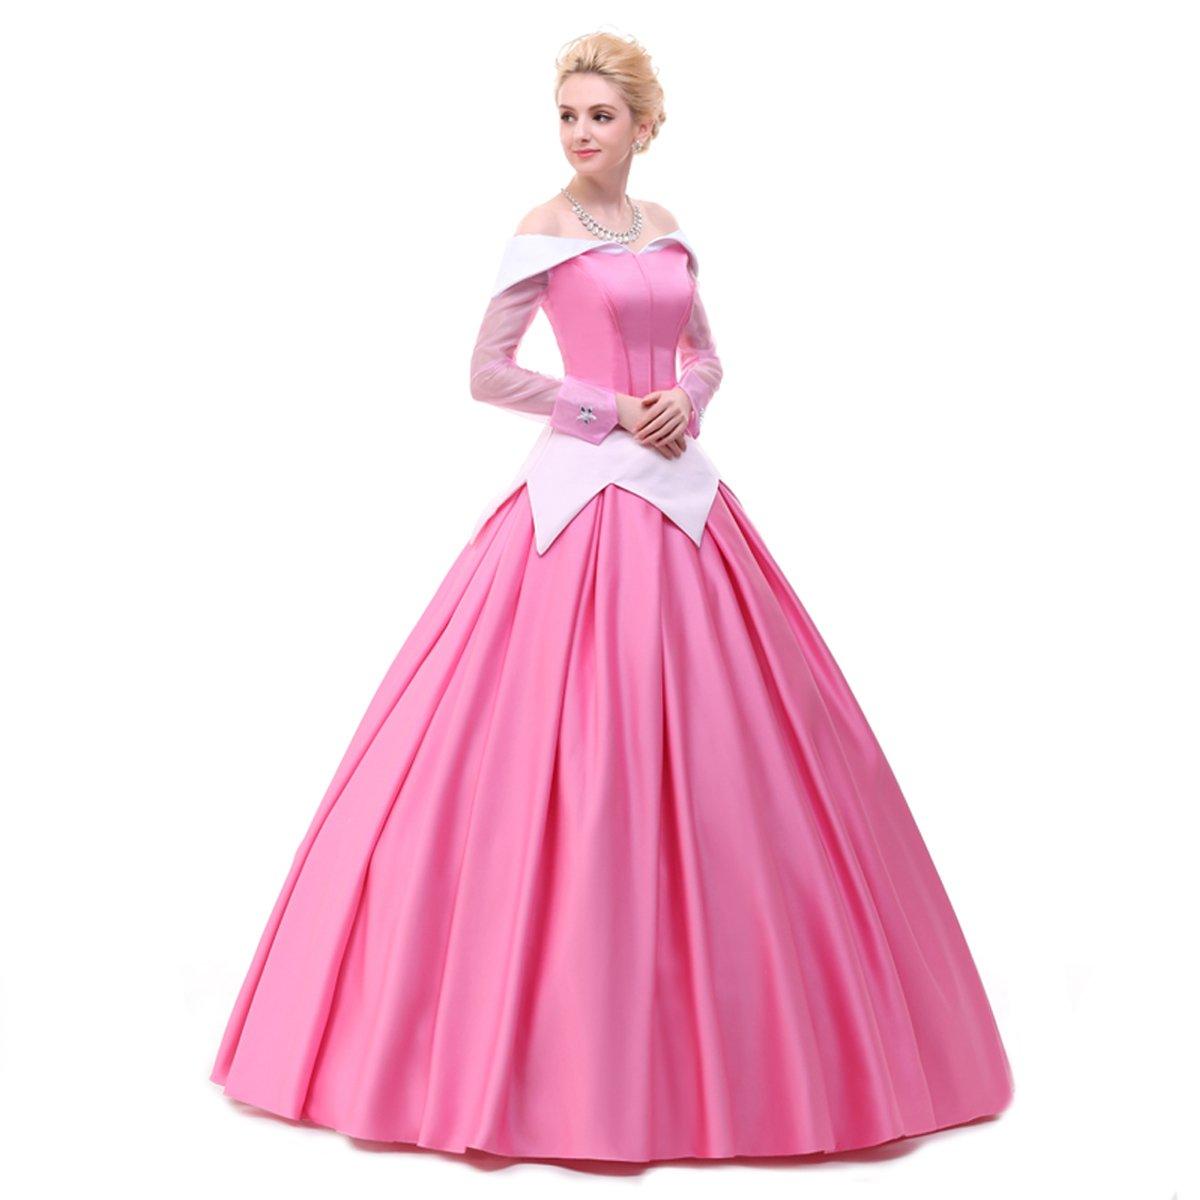 Angelaicos Womens Deluxe Princess Costumes Satin Lolita Dress Cloak Petticoat (M, Pink) by Angelaicos